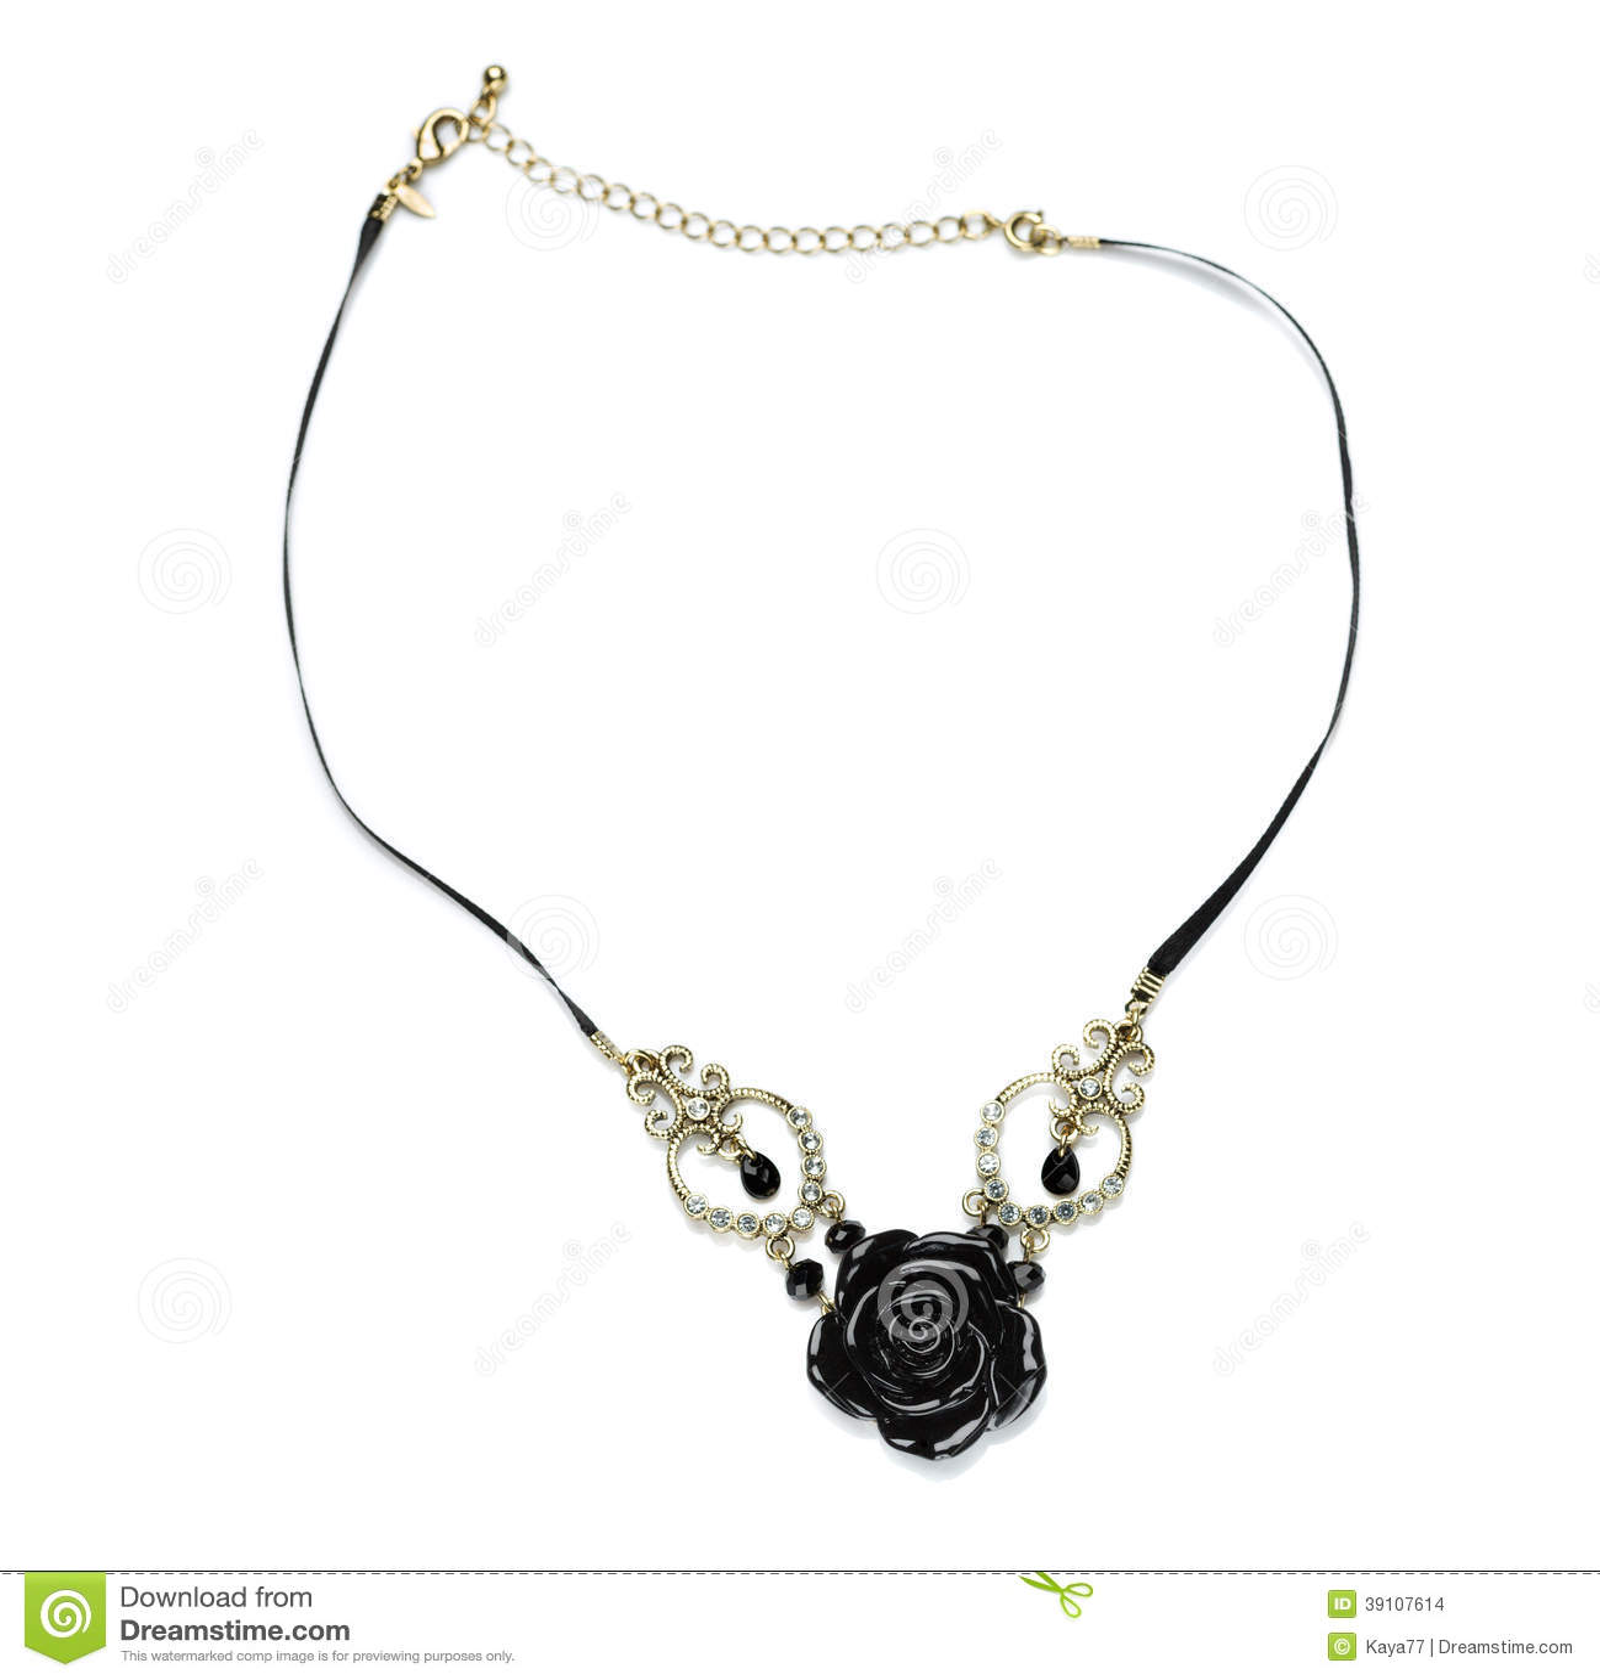 Nam de halsband zwarte steen toe.